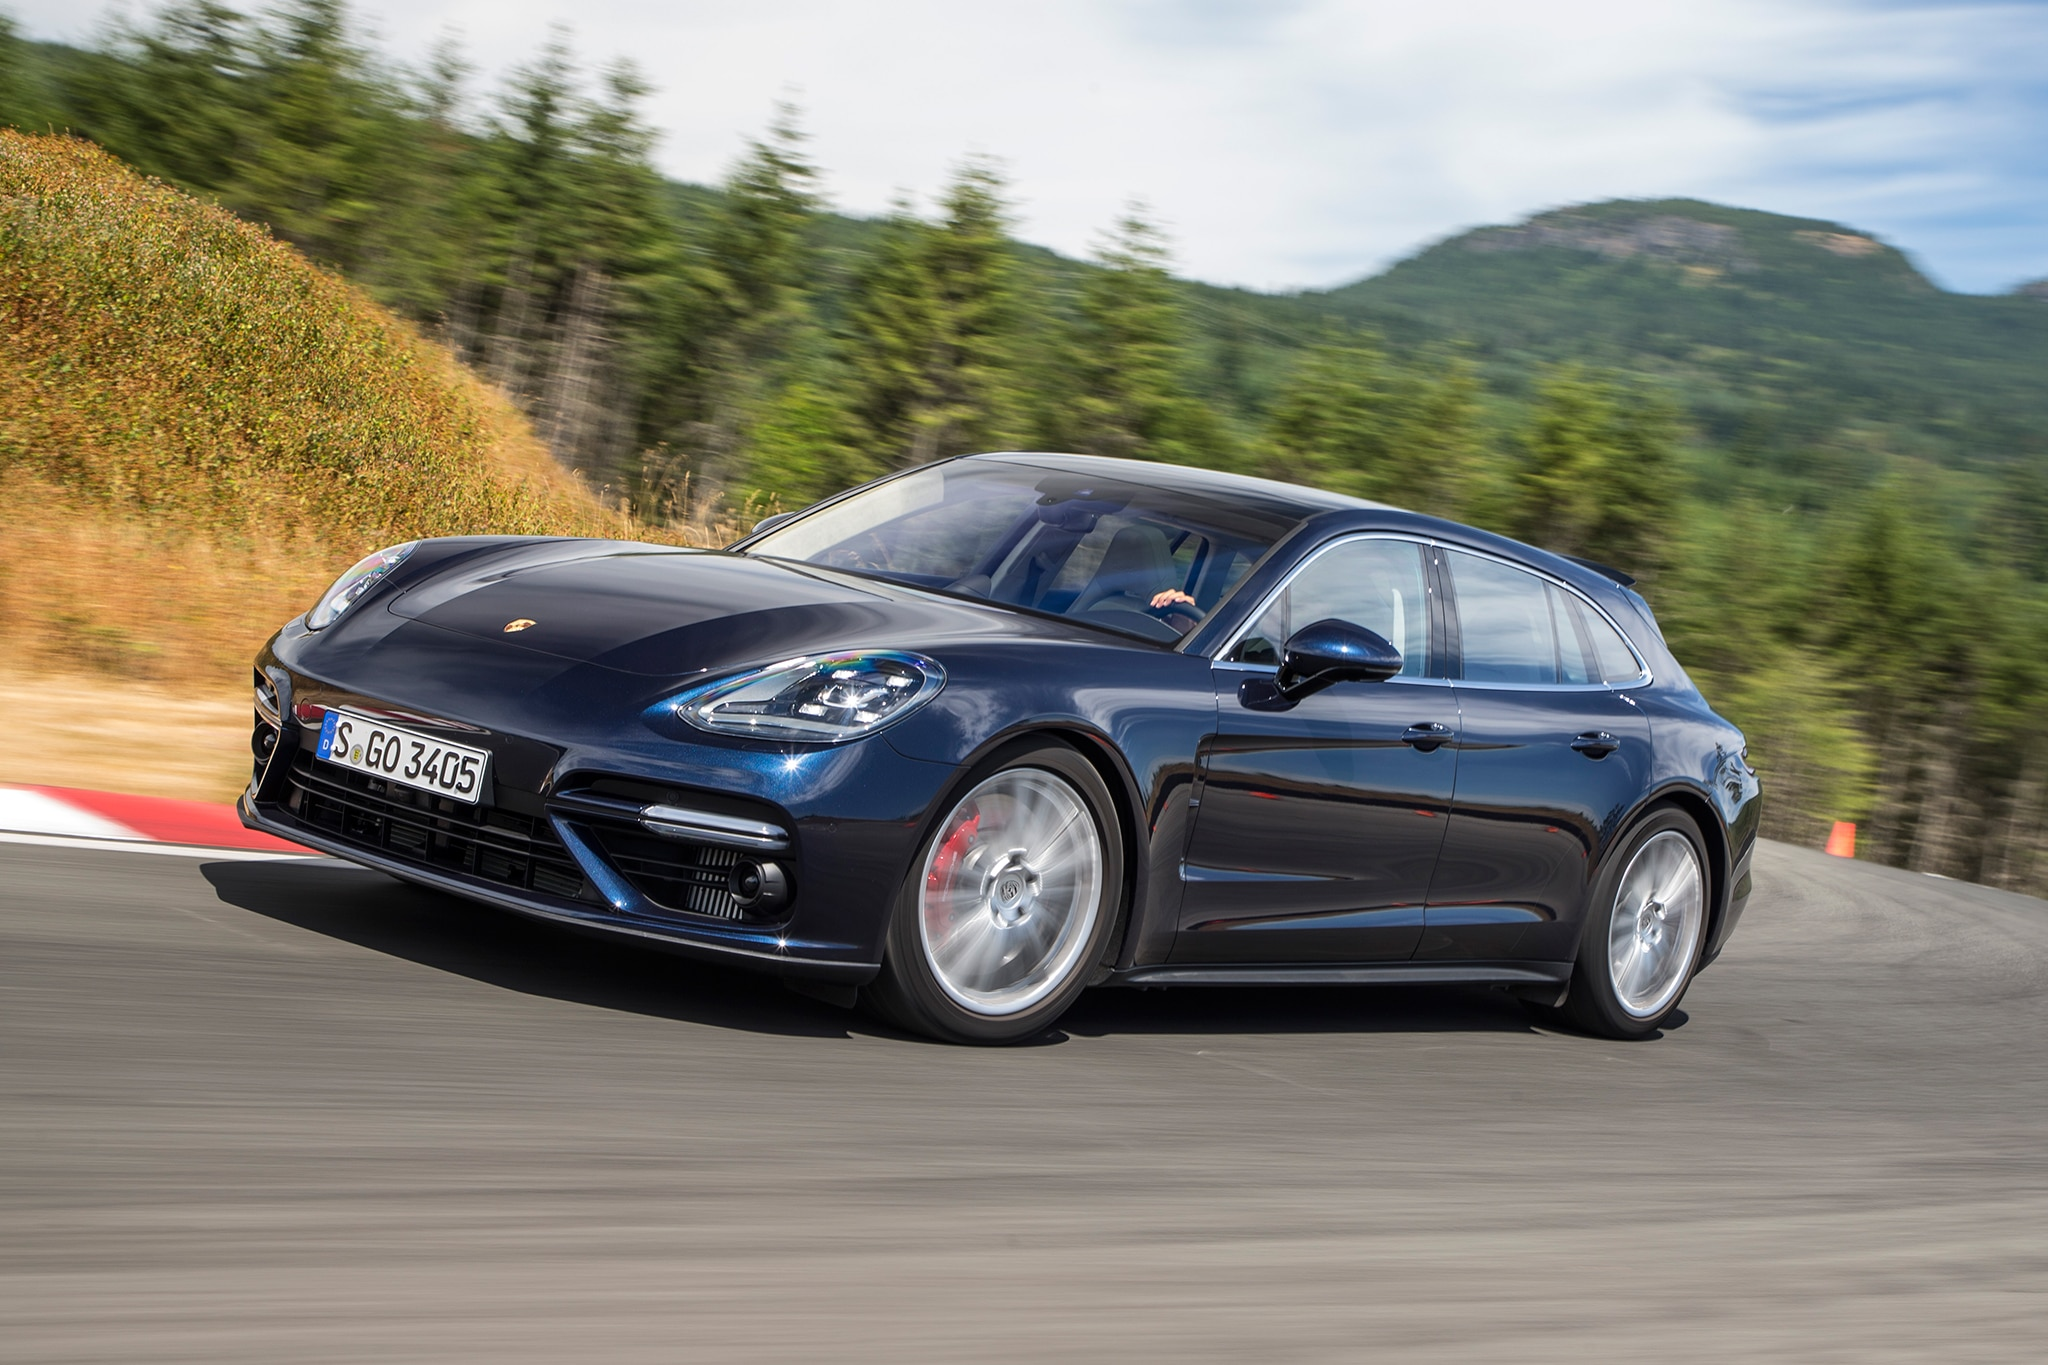 2018 Porsche Panamera Sport Turismo Front Three Quarter In Motion 01